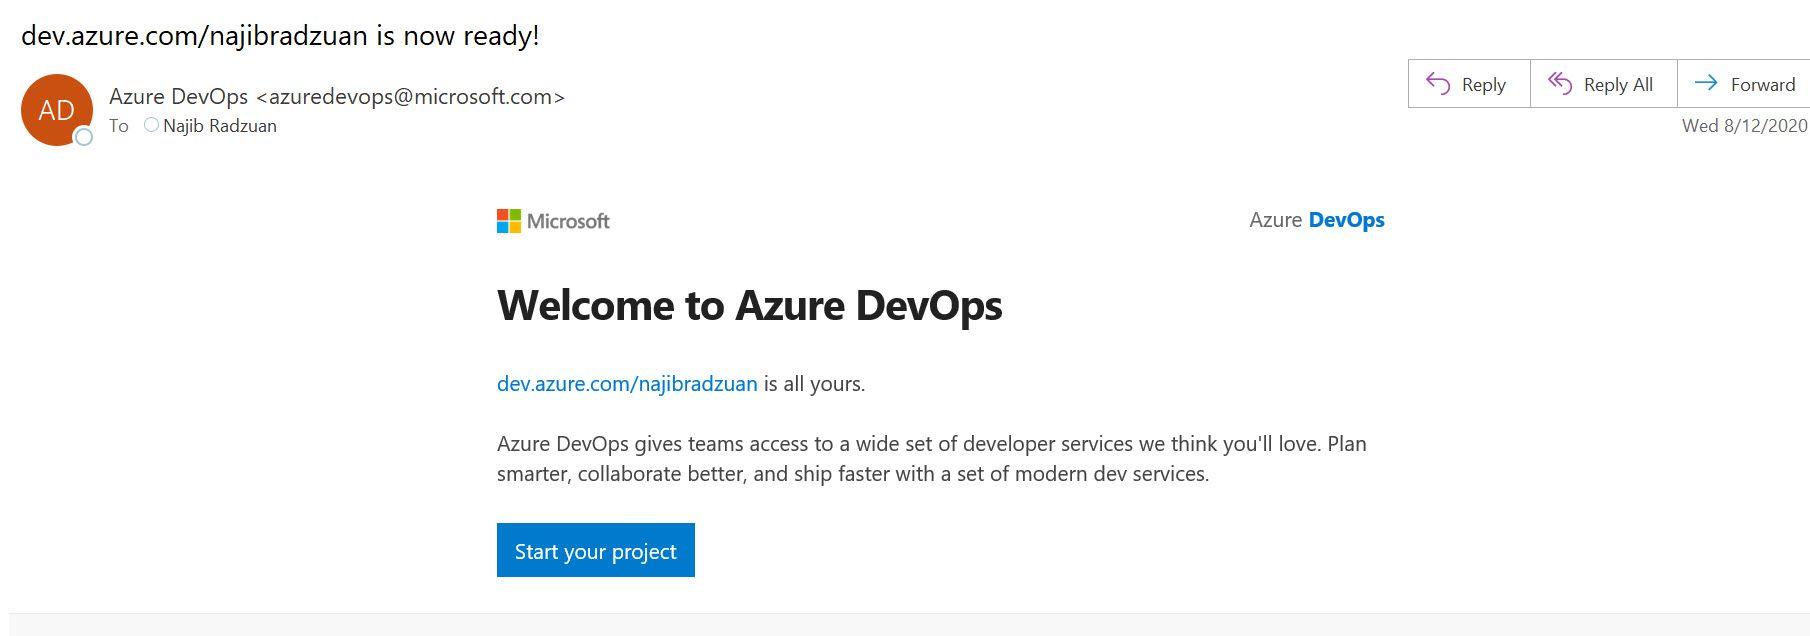 Azure-DevOps-Welcome-Email-1